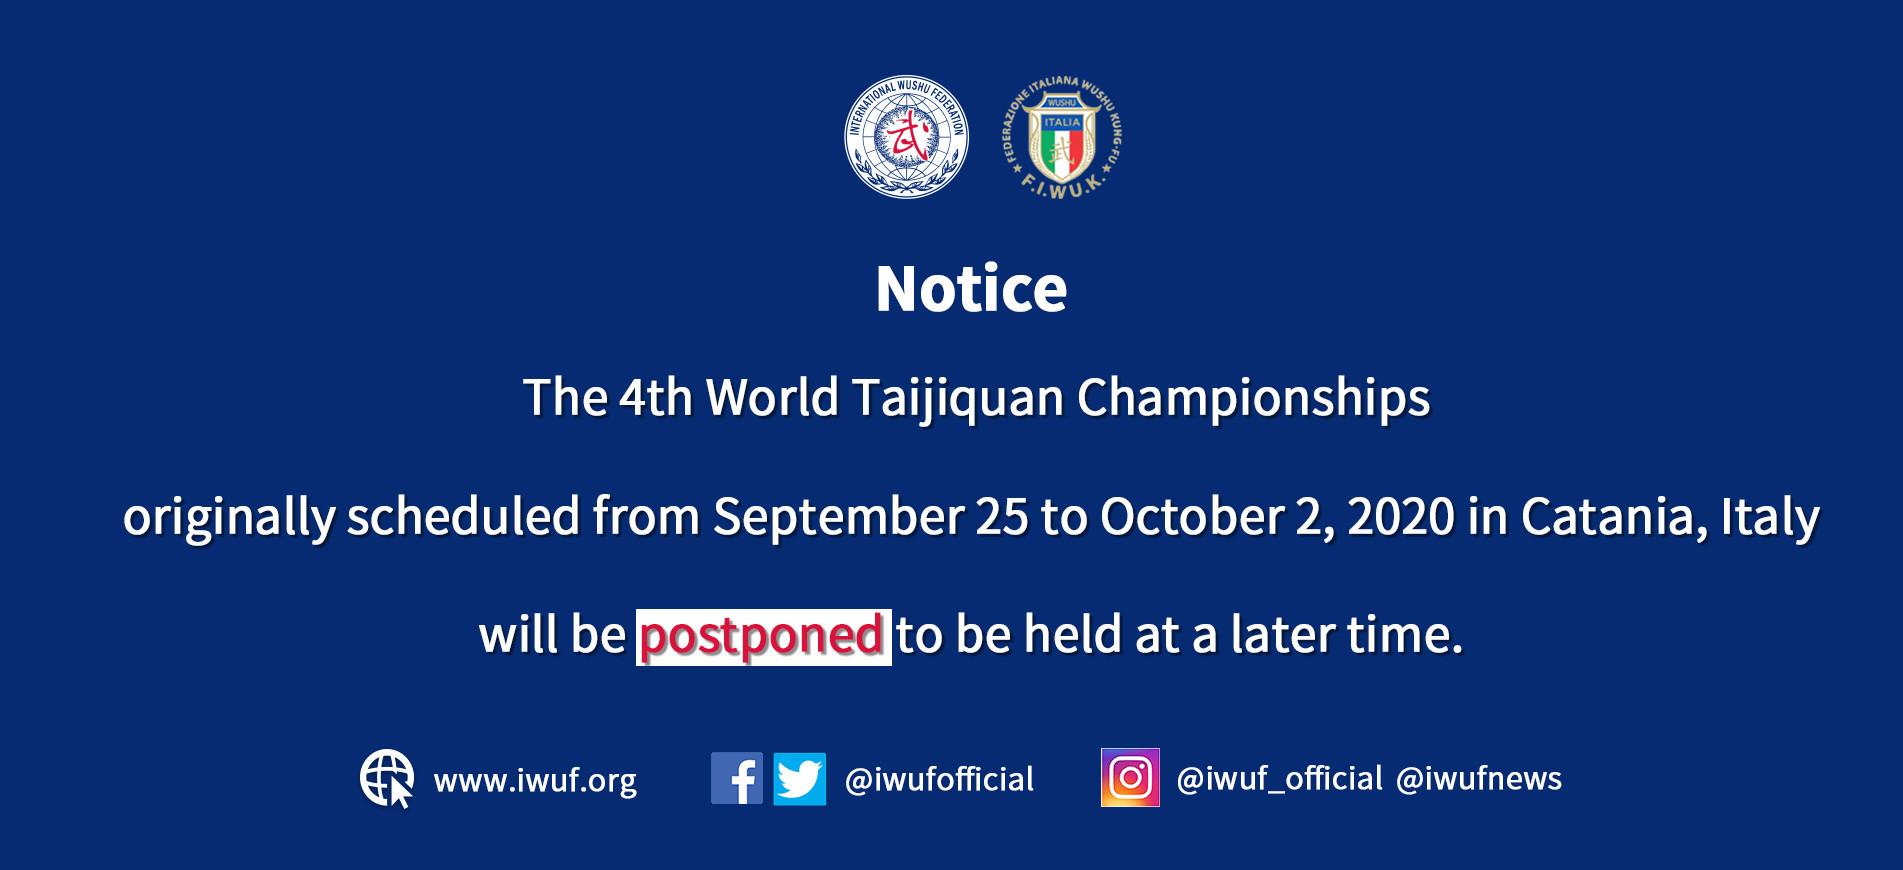 International Wushu Federation postpones World Taijiquan Championships